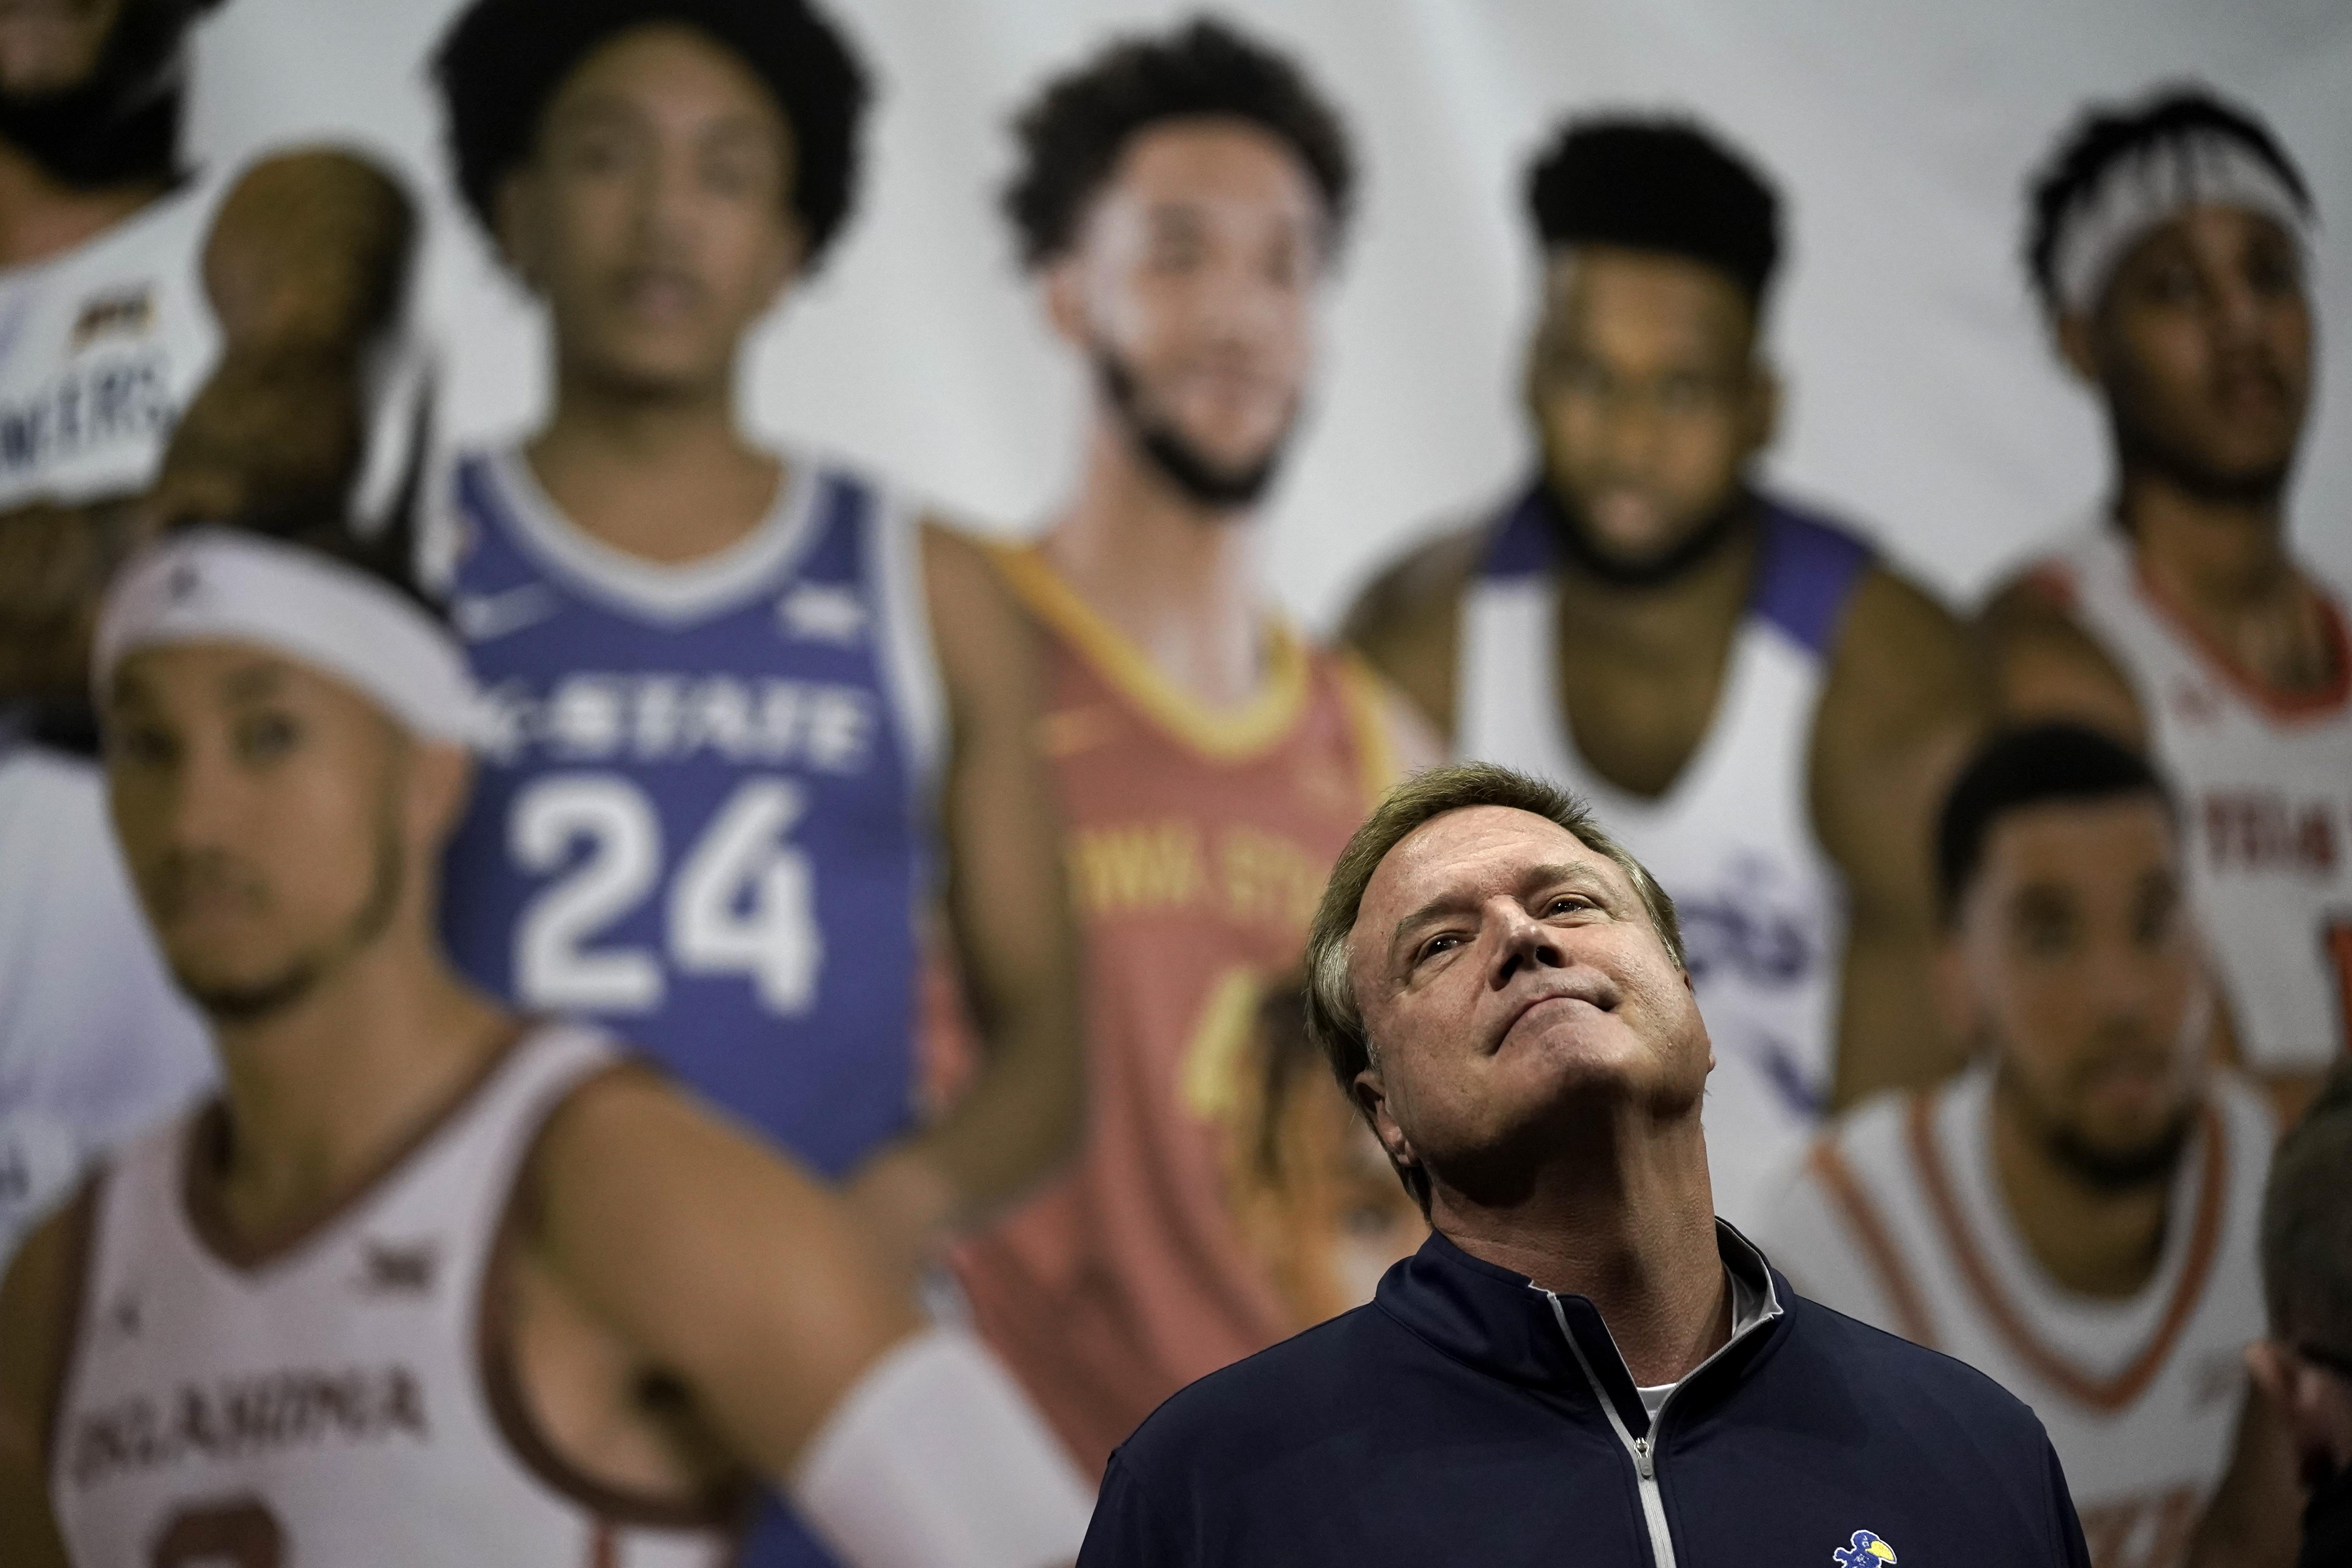 Kansas coach Bill Self waits for group photo during Big 12 basketball media day Wednesday, Oct. 20, 2021, in Kansas City, Mo.